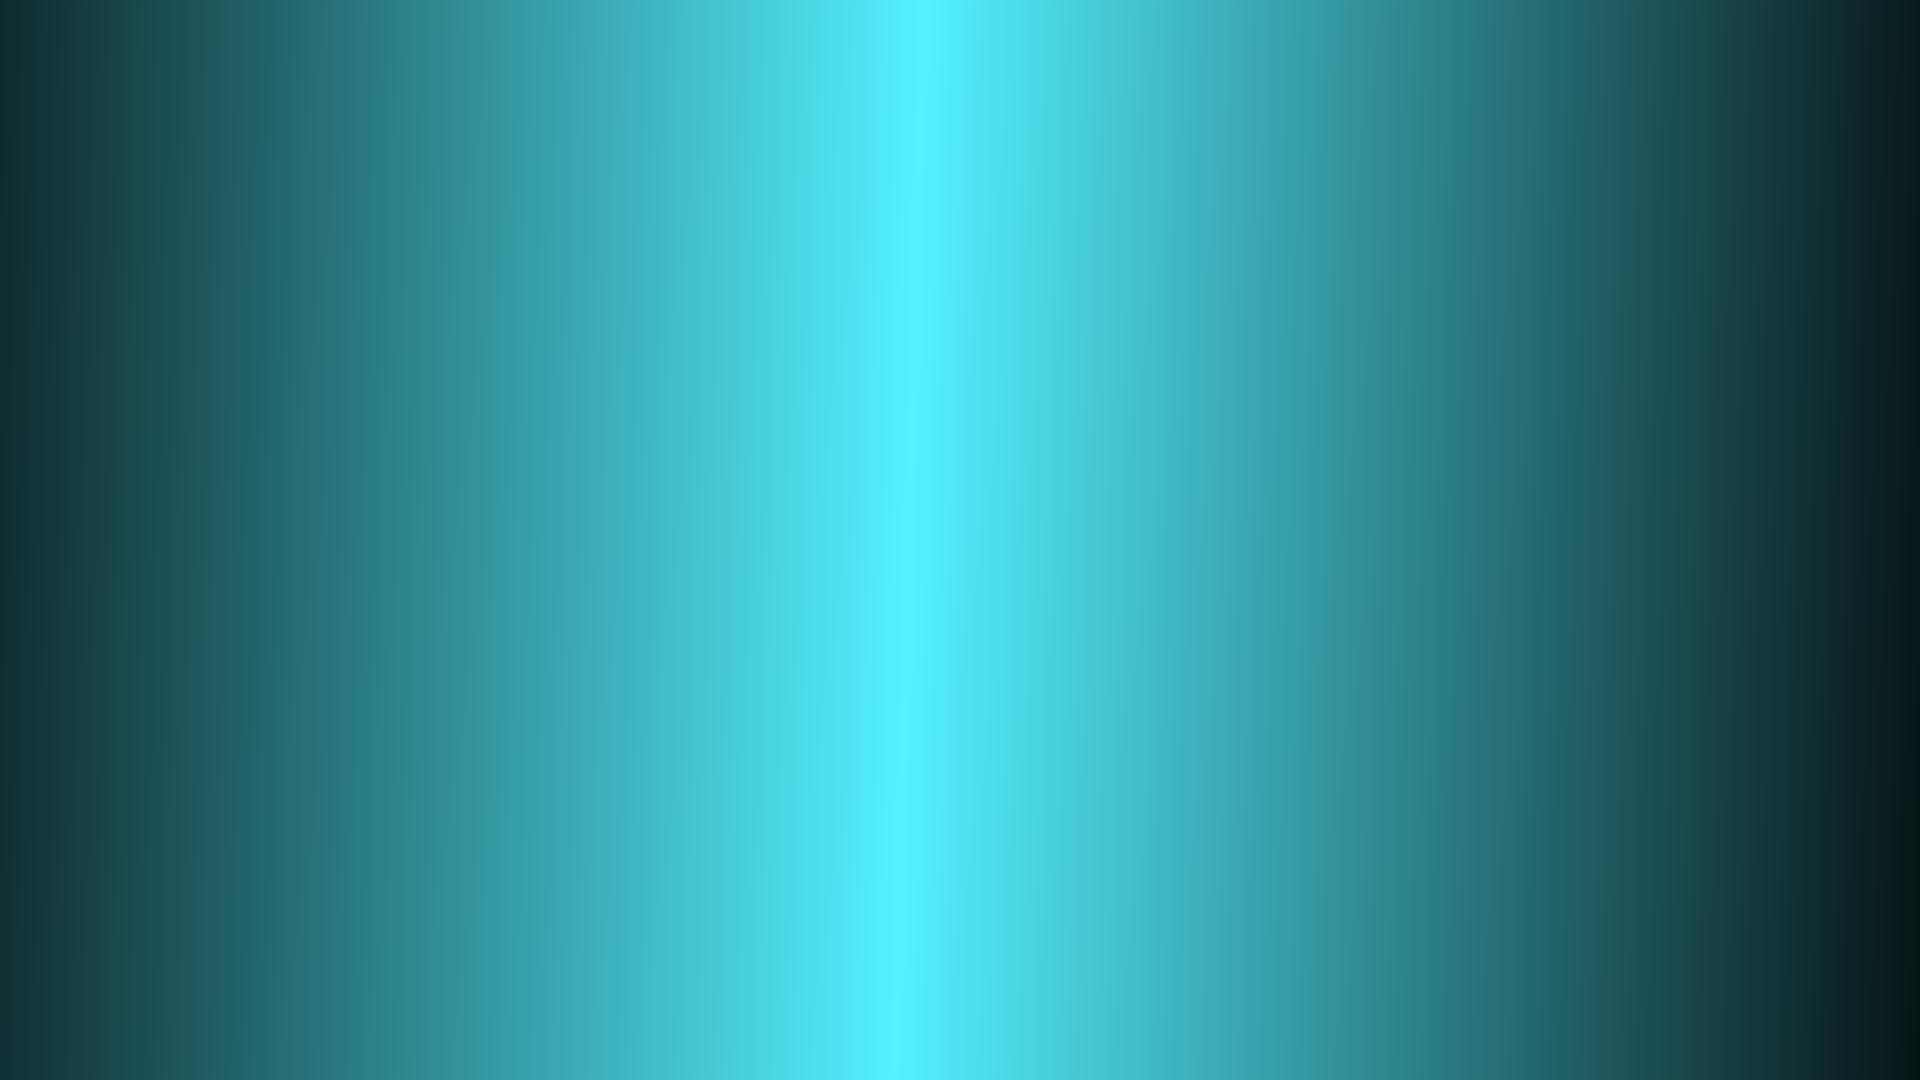 desktop wallpaper gradient black sky blue backgrounds central 1920x1080